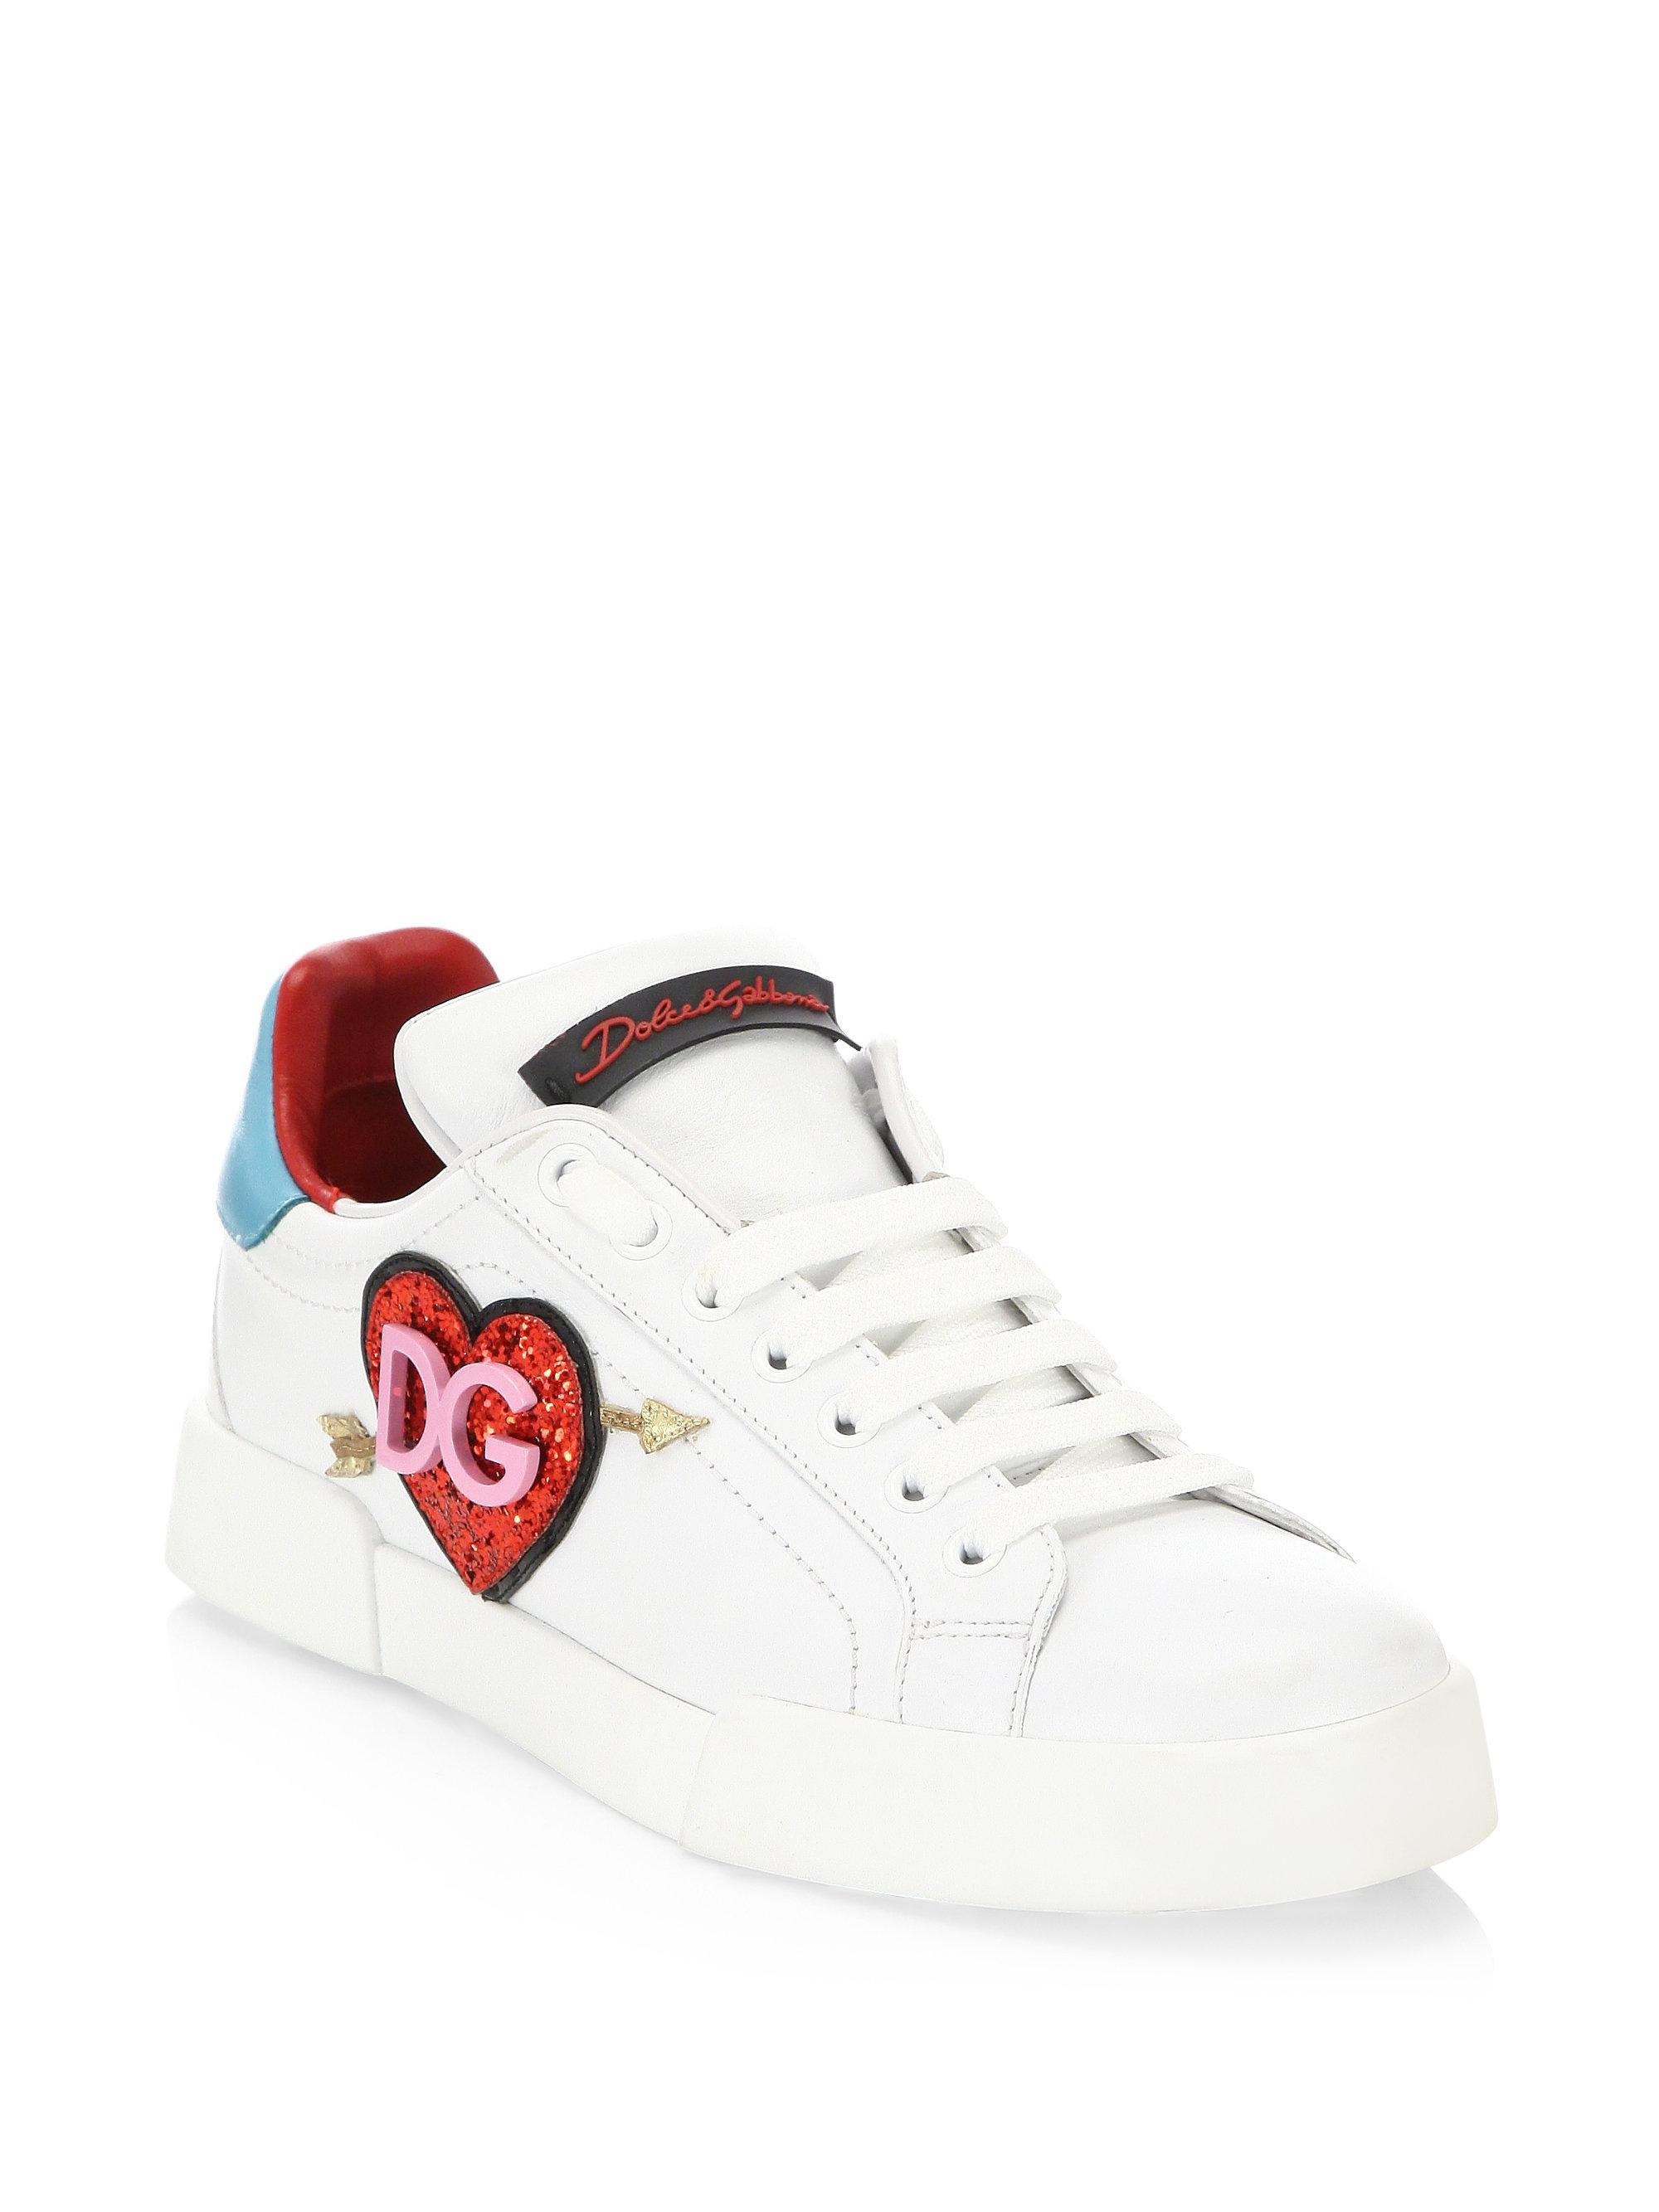 Dolce & Gabbana Glitter Heart Logo Leather Sneakers